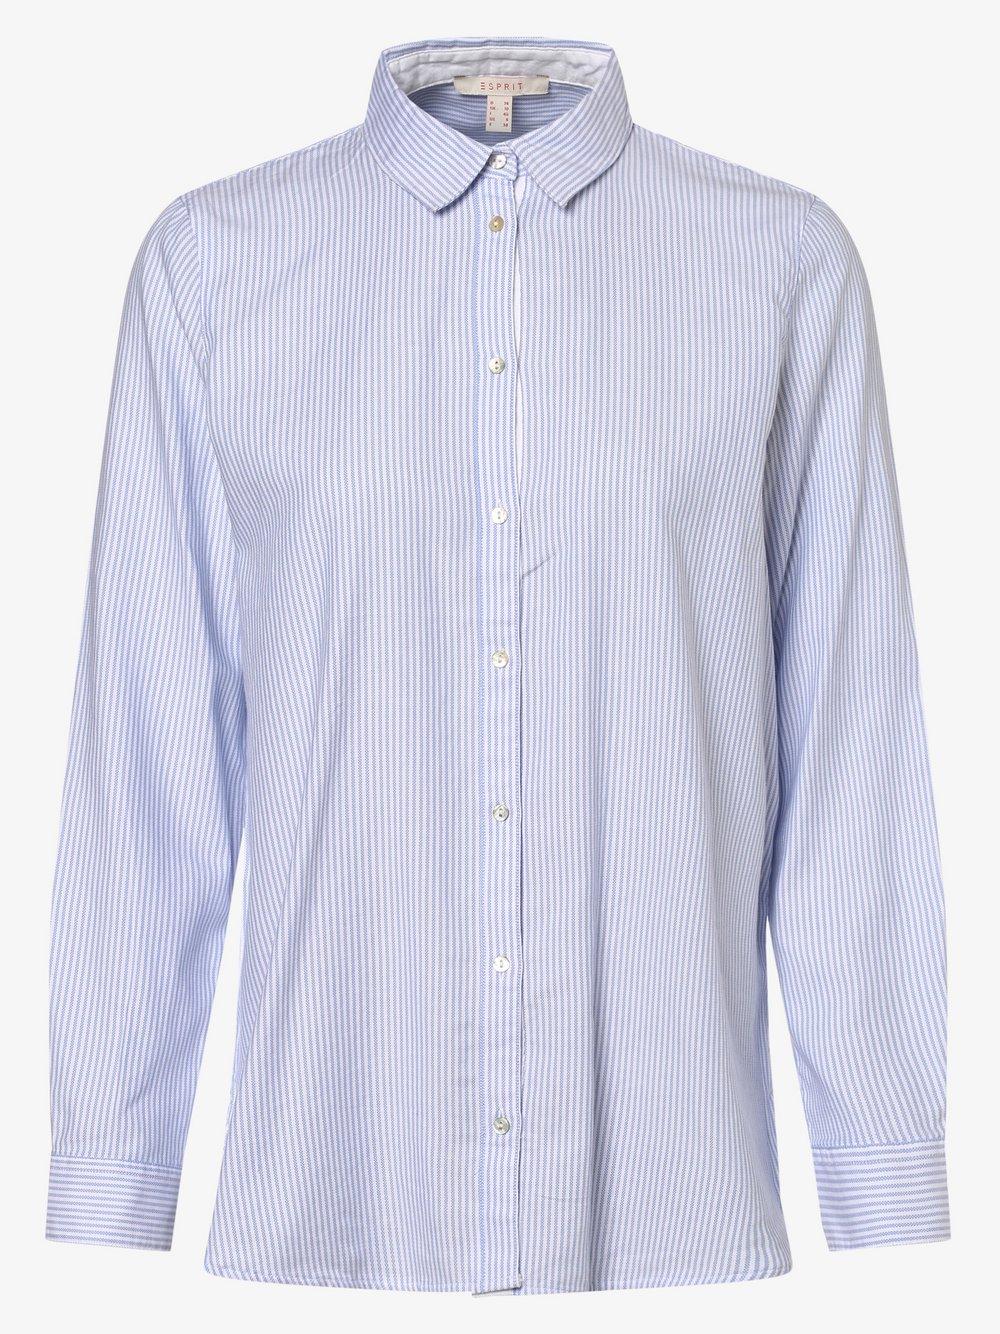 Esprit Casual – Bluzka damska, biały Van Graaf 479743-0001-00360